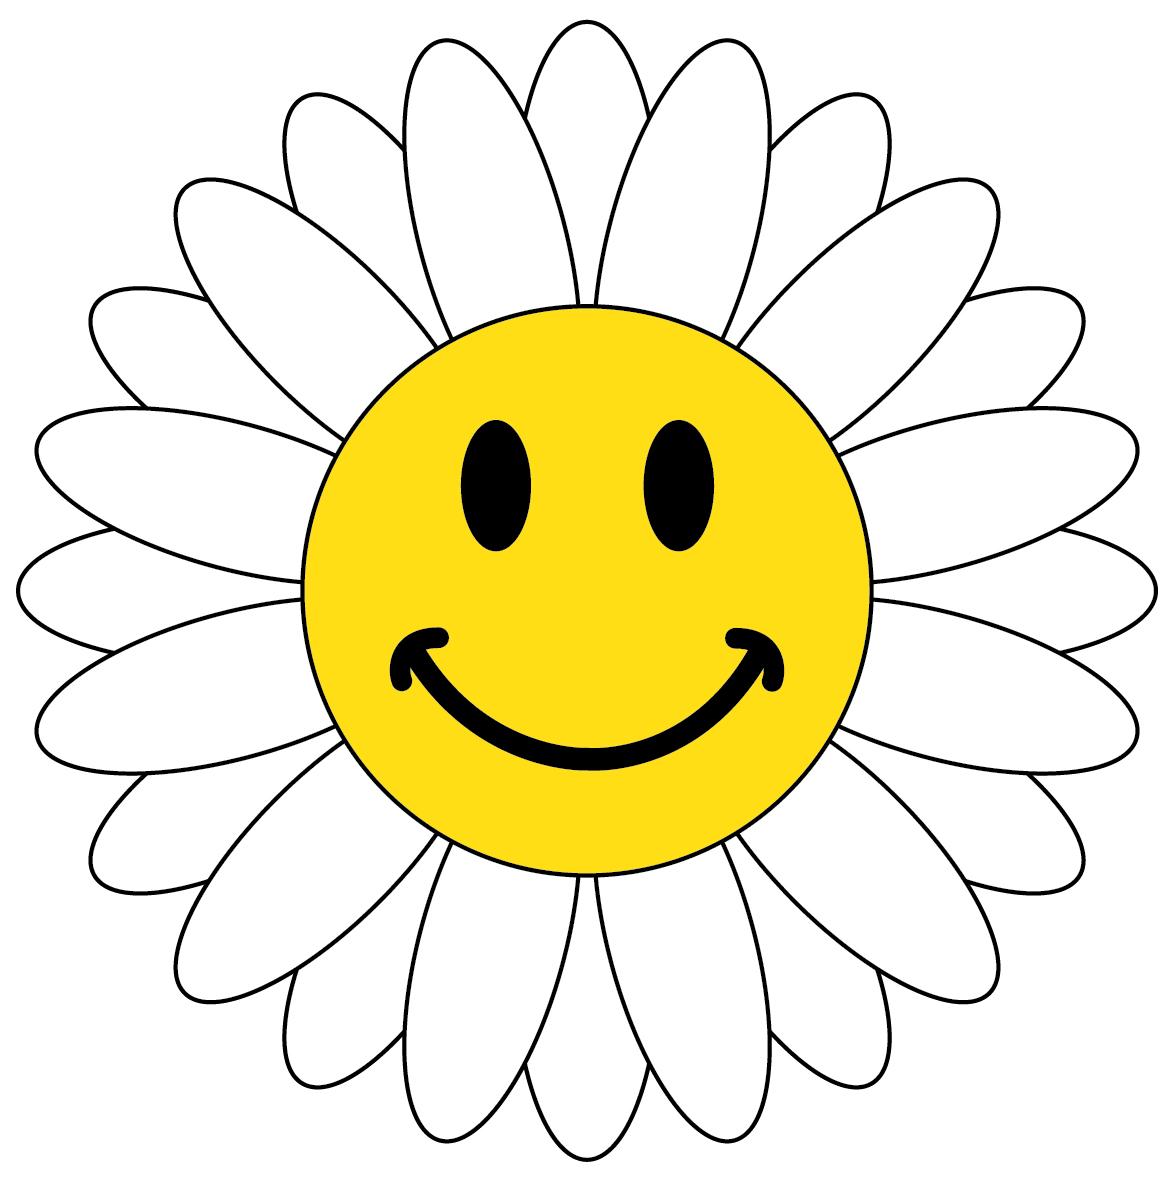 Flower smiley face clipart clip art stock Best Smiley Face Flower #23603 - Clipartion.com clip art stock